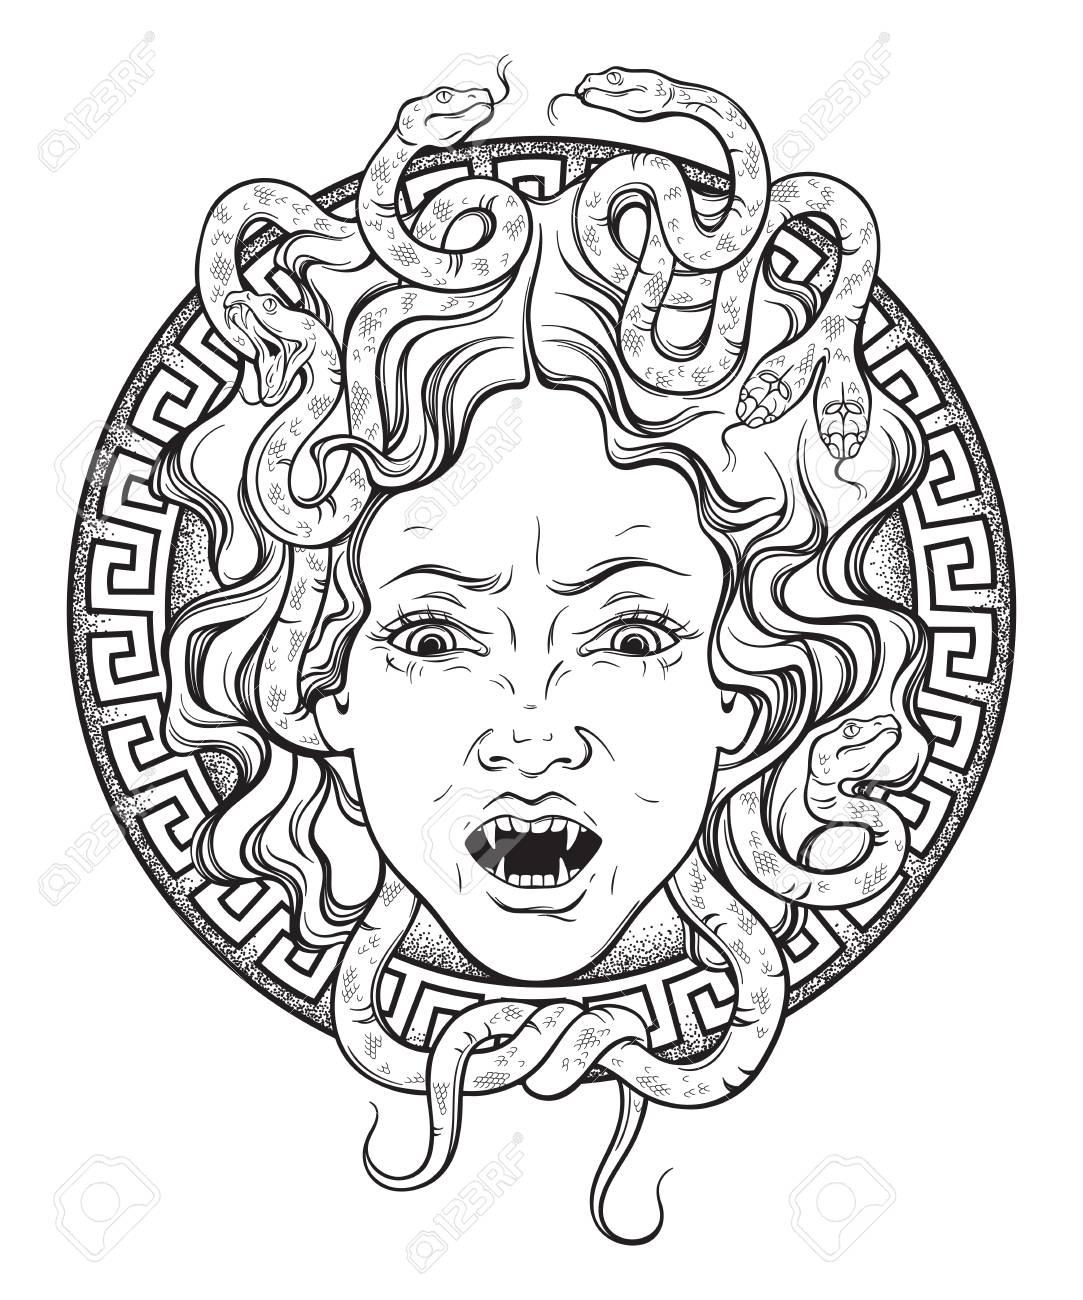 Saiya Power Upgrade: Stone Arsenal (Gorgon Form) 97677744-medusa-gorgon-head-on-a-shield-hand-drawn-line-art-and-dot-work-tattoo-or-print-design-isolated-vect